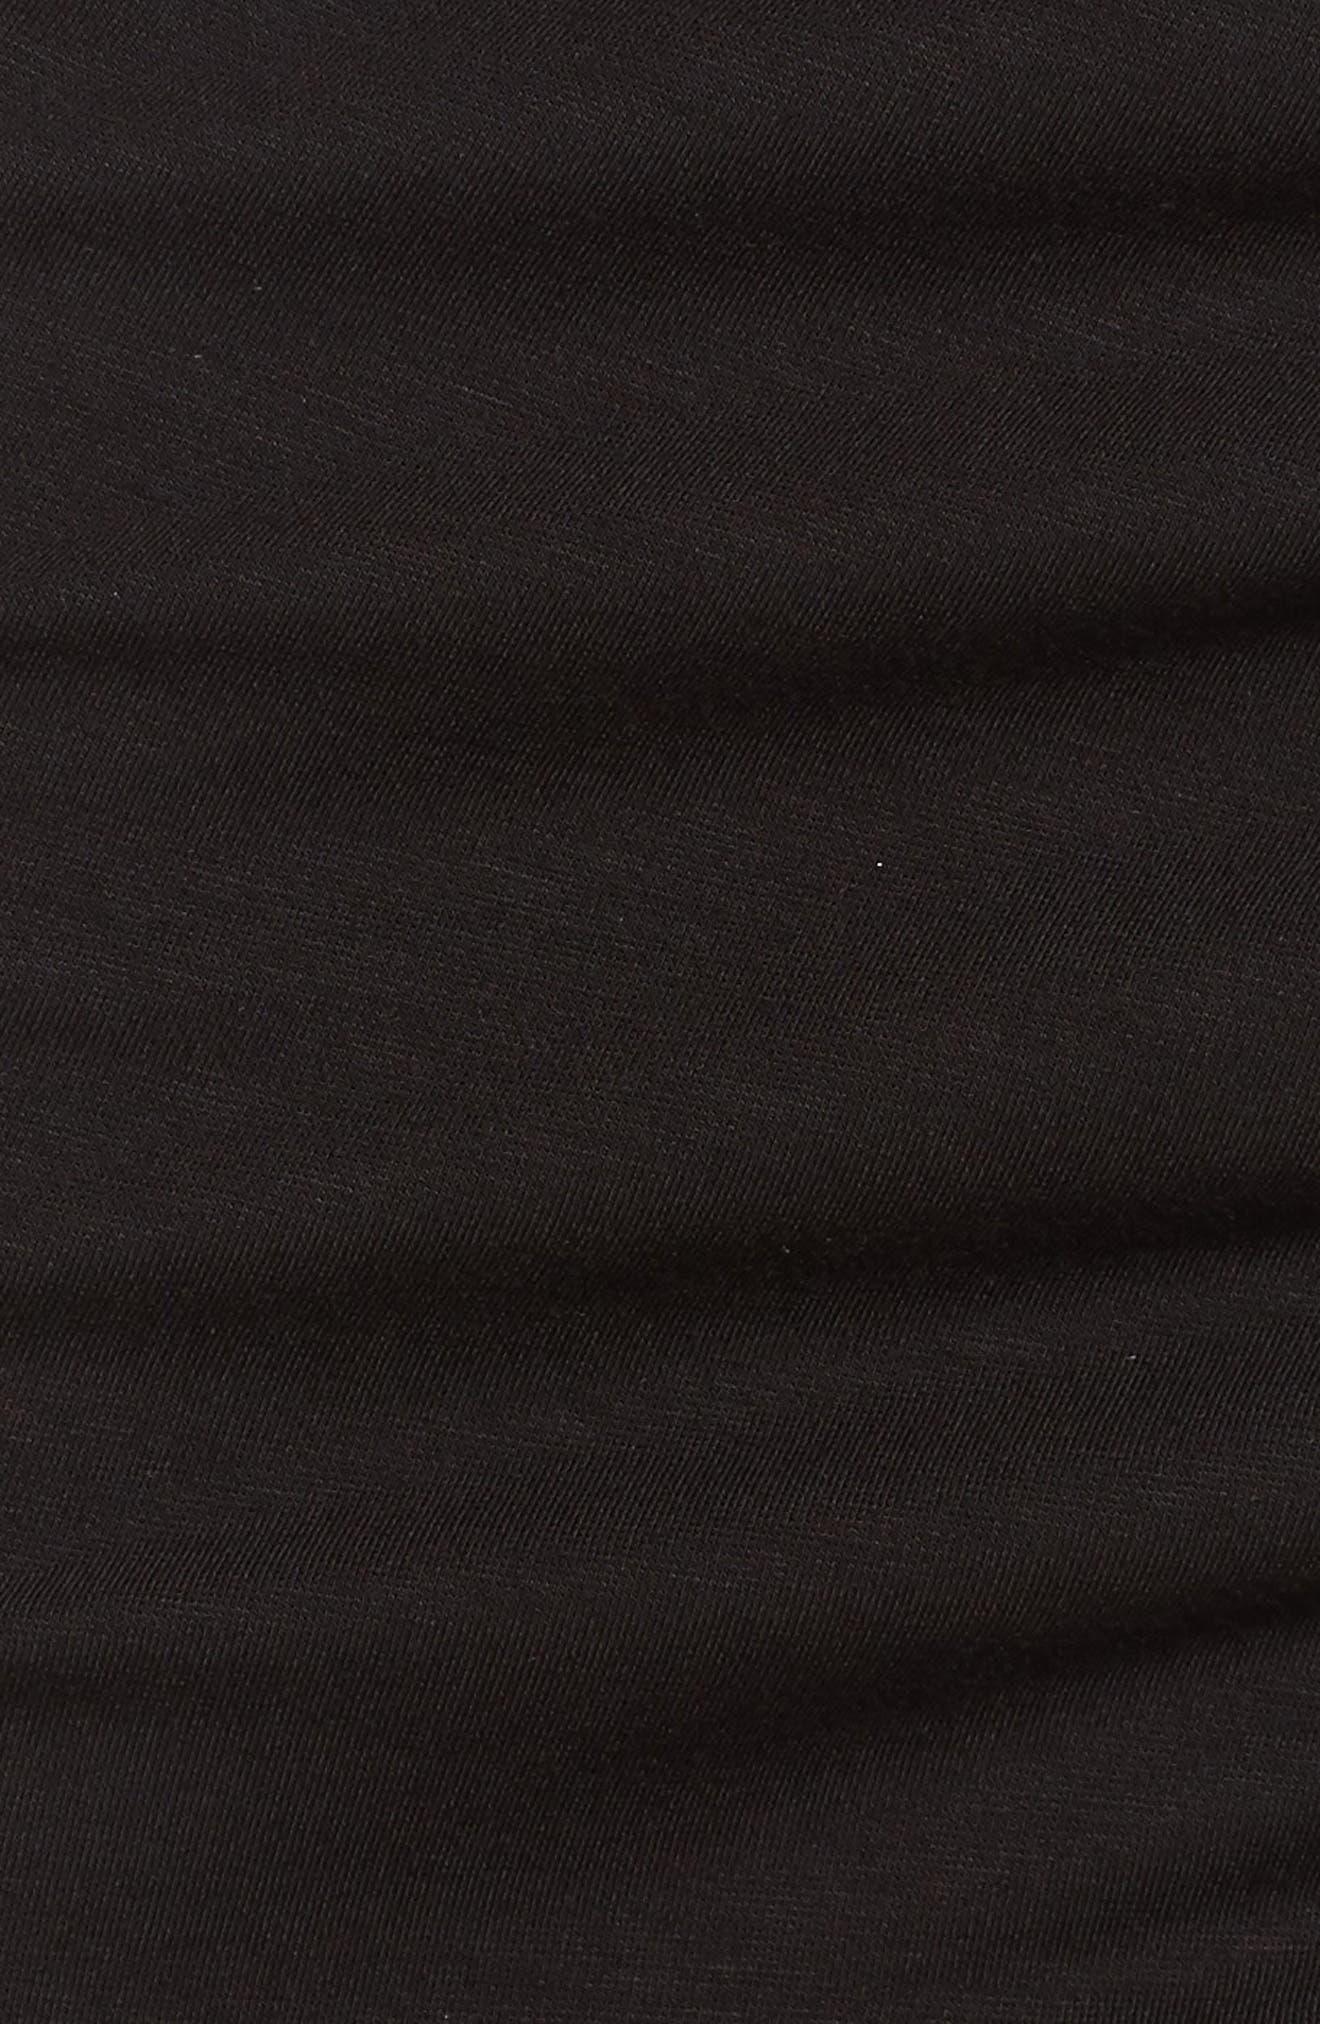 Side Ruffle Pencil Skirt,                             Alternate thumbnail 5, color,                             001